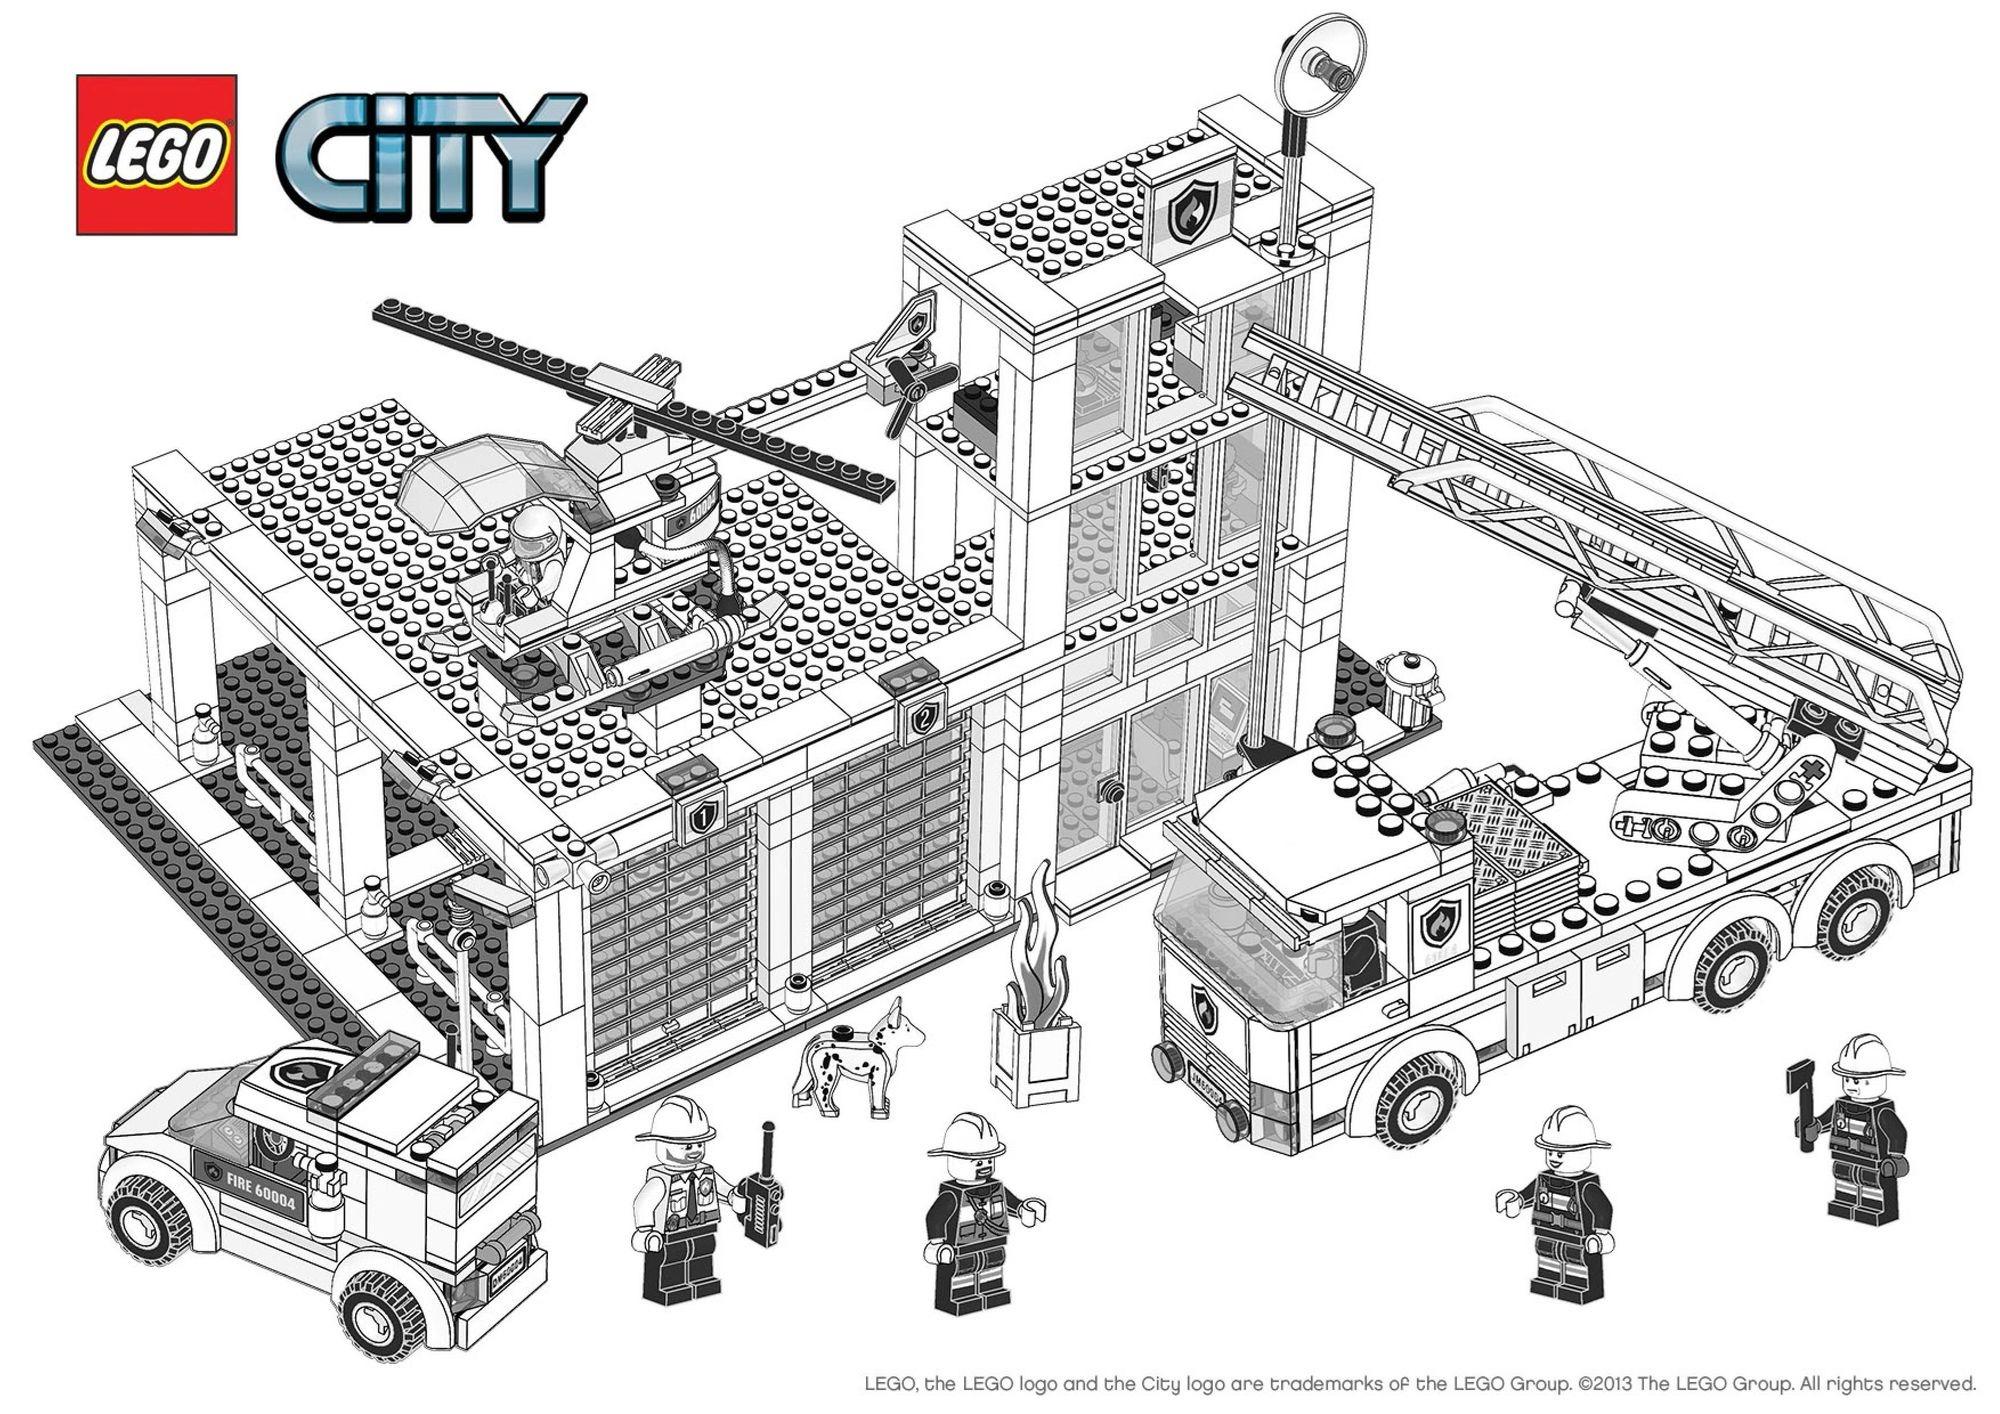 Coloriage Camion Lego.Coloriage Lego City La Caserne Des Pompiers Coloriage